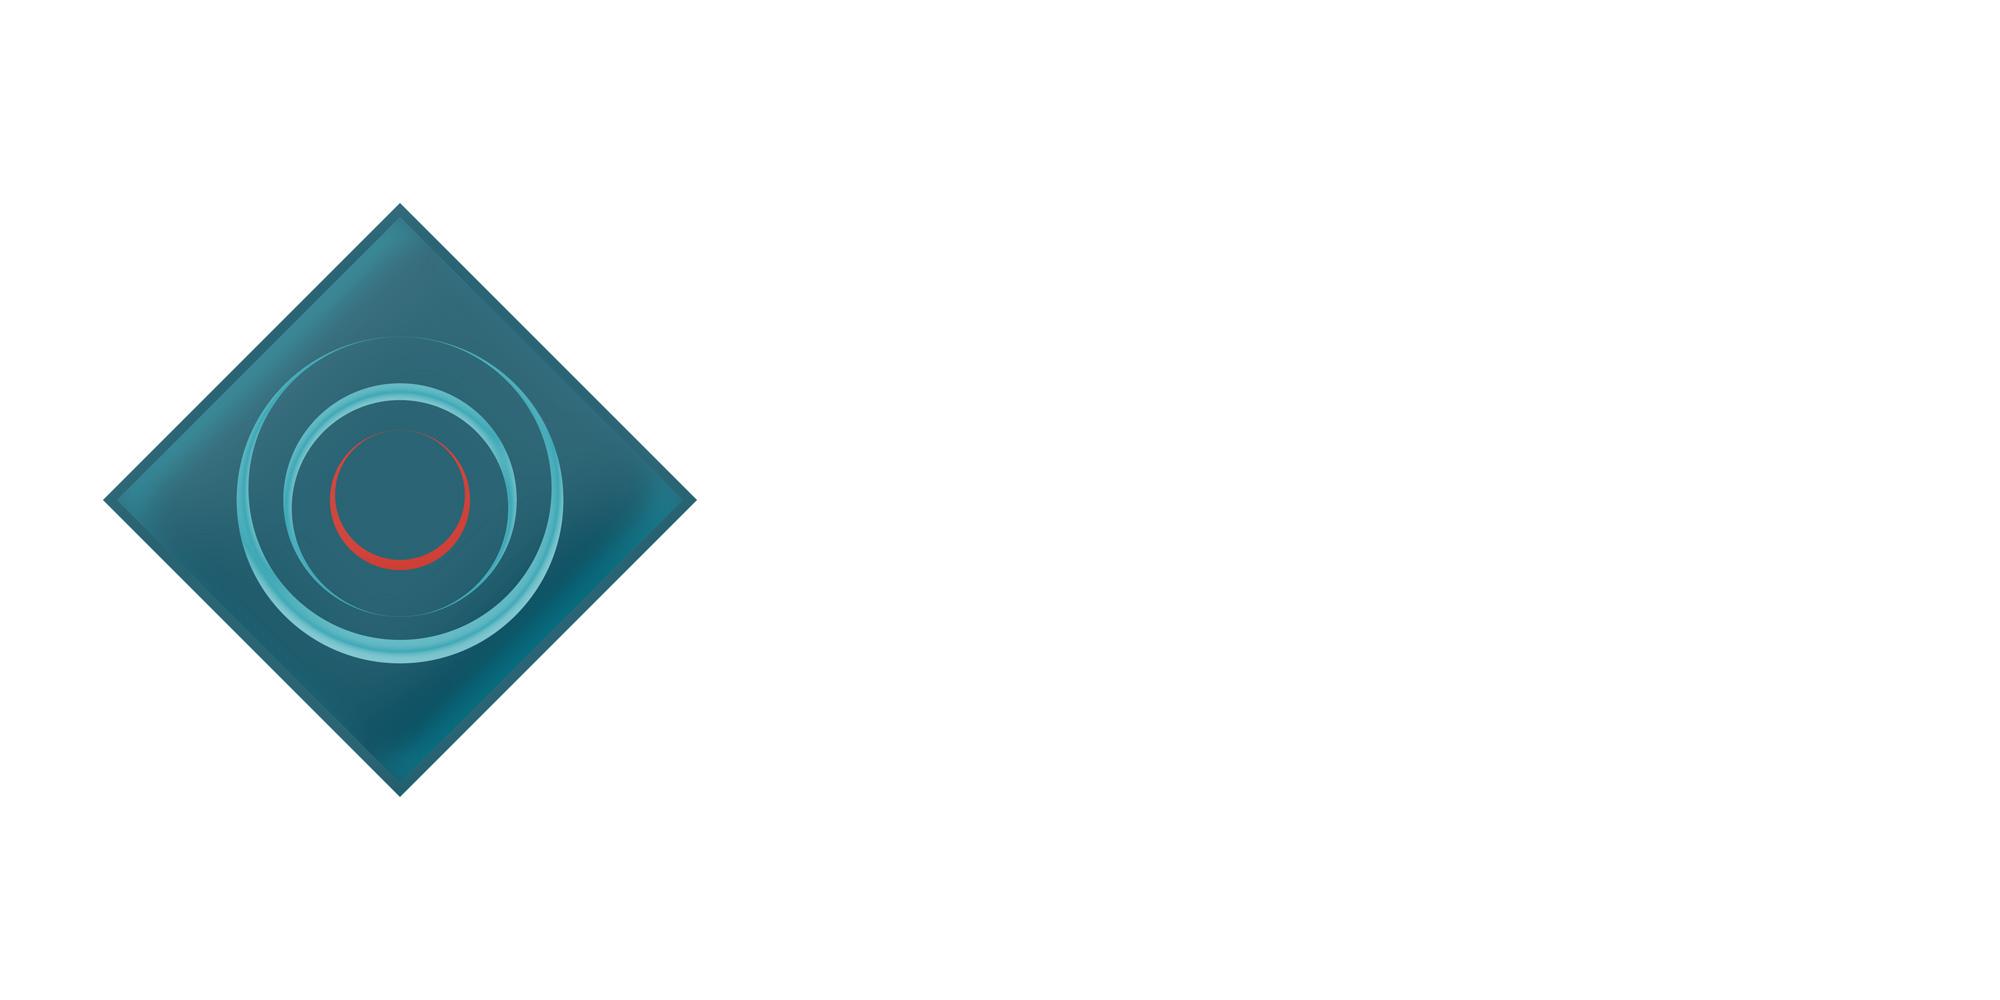 KRA-logo-icons-1.jpg